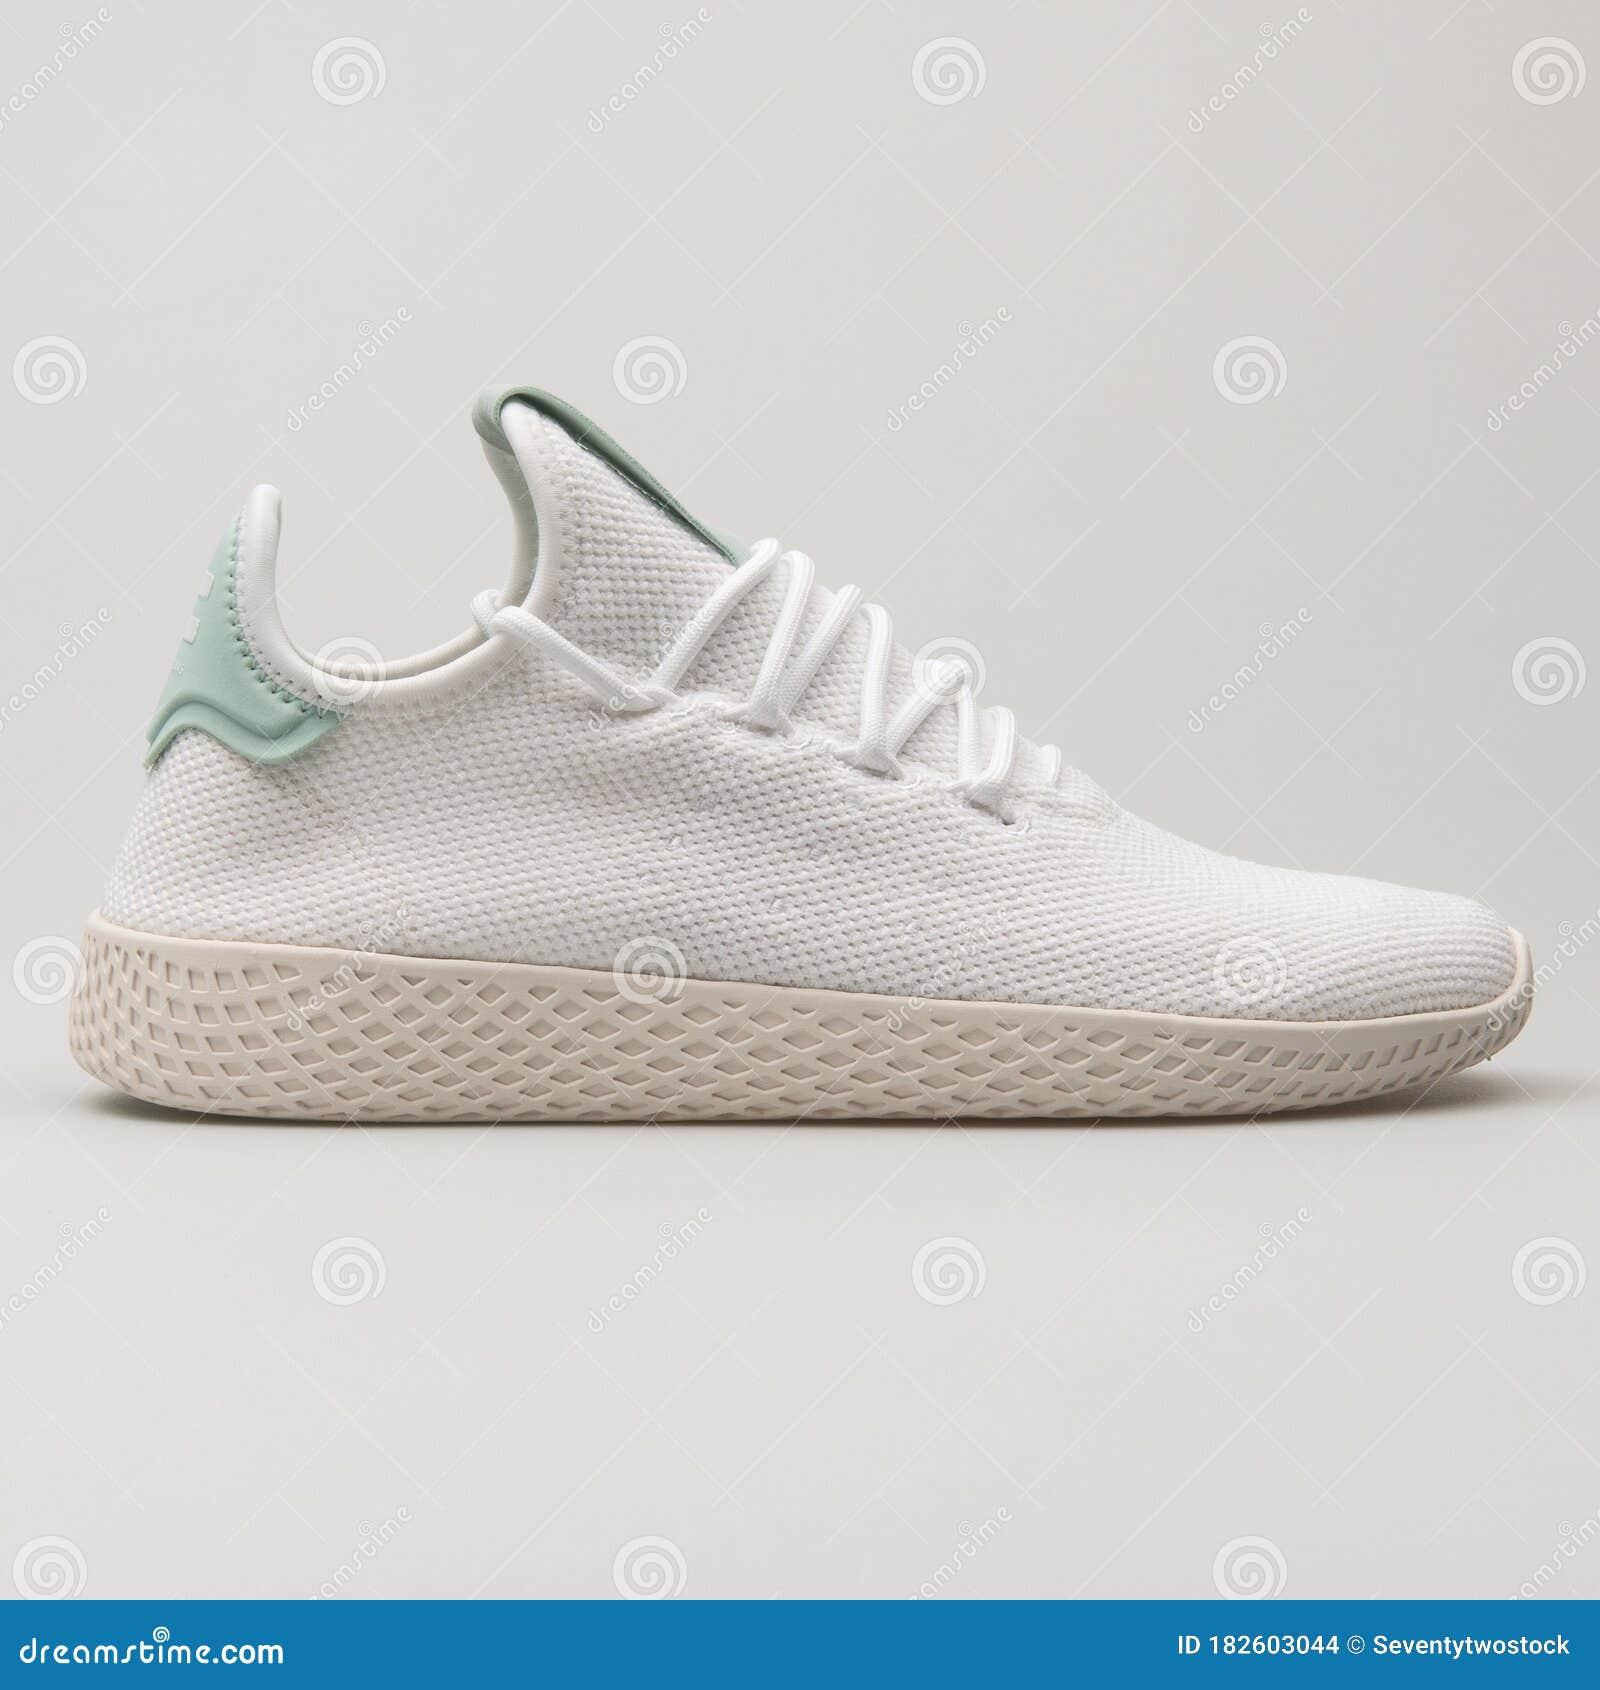 cobija Hamburguesa equilibrio  Adidas PW Tennis HU White And Green Sneaker Editorial Stock Image - Image  of sole, fashion: 182603044